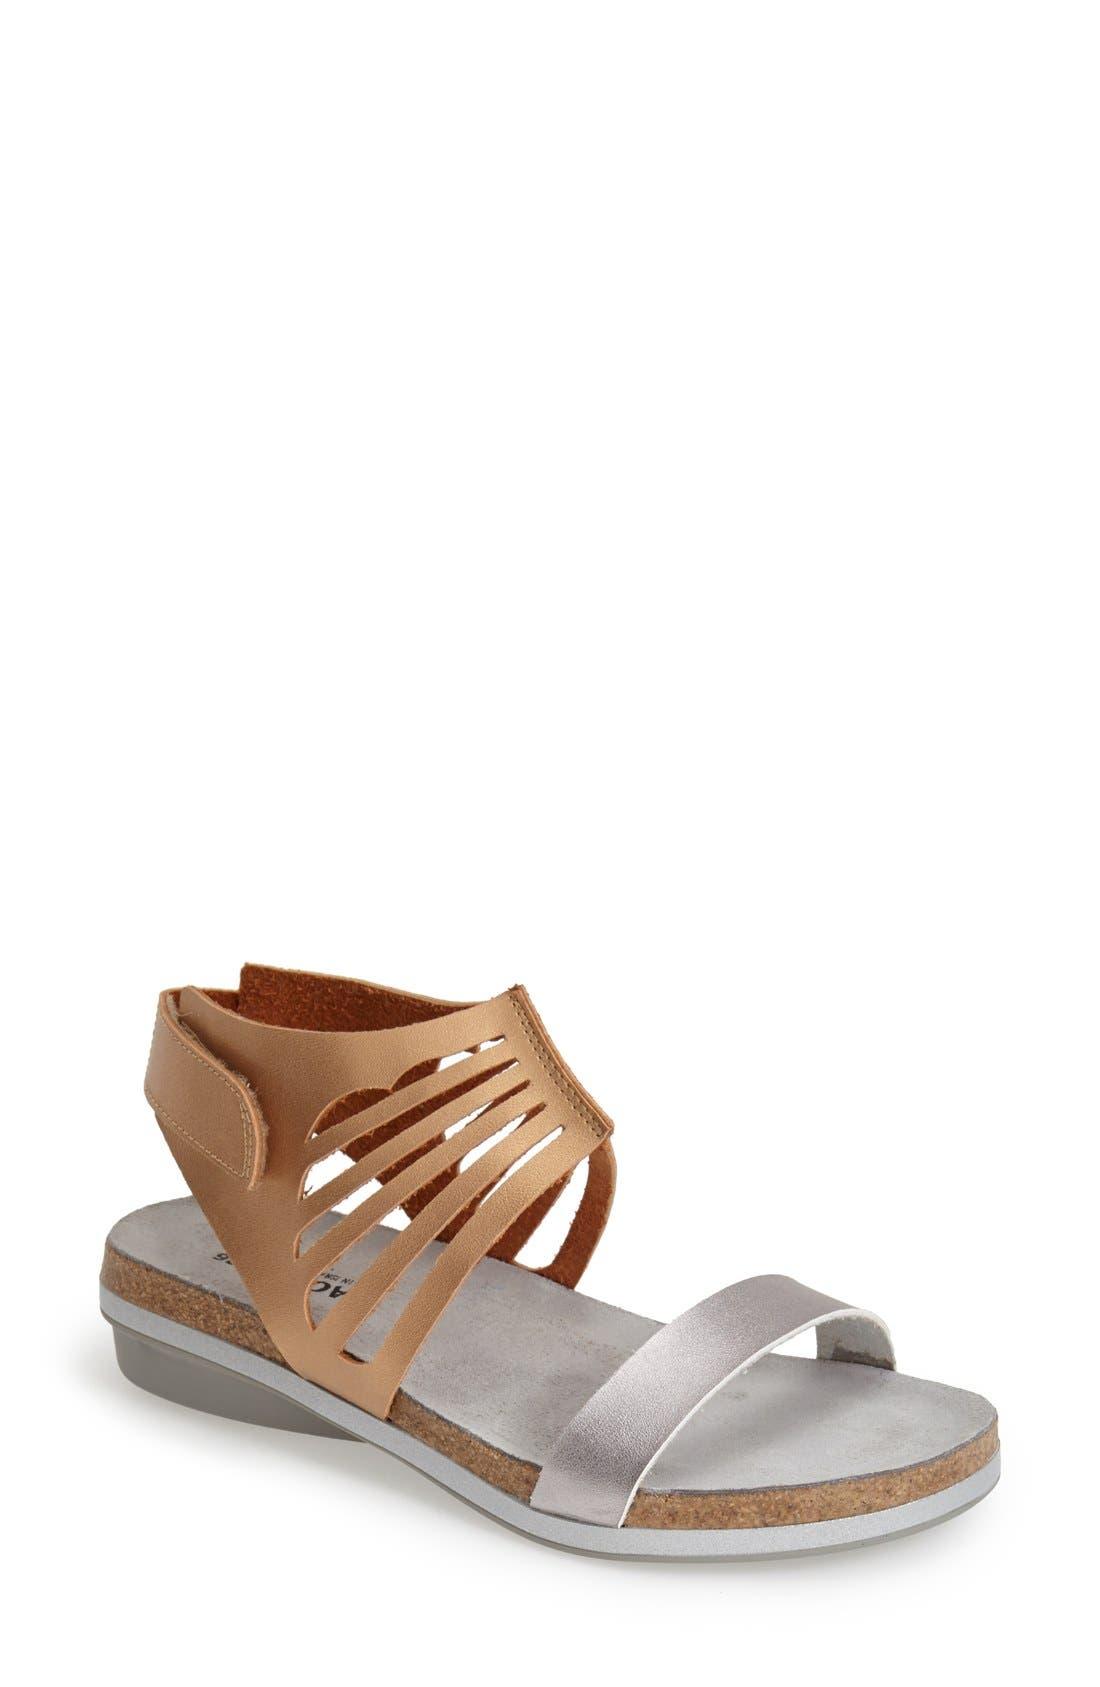 Main Image - Naot 'Mint' Sandal (Women)